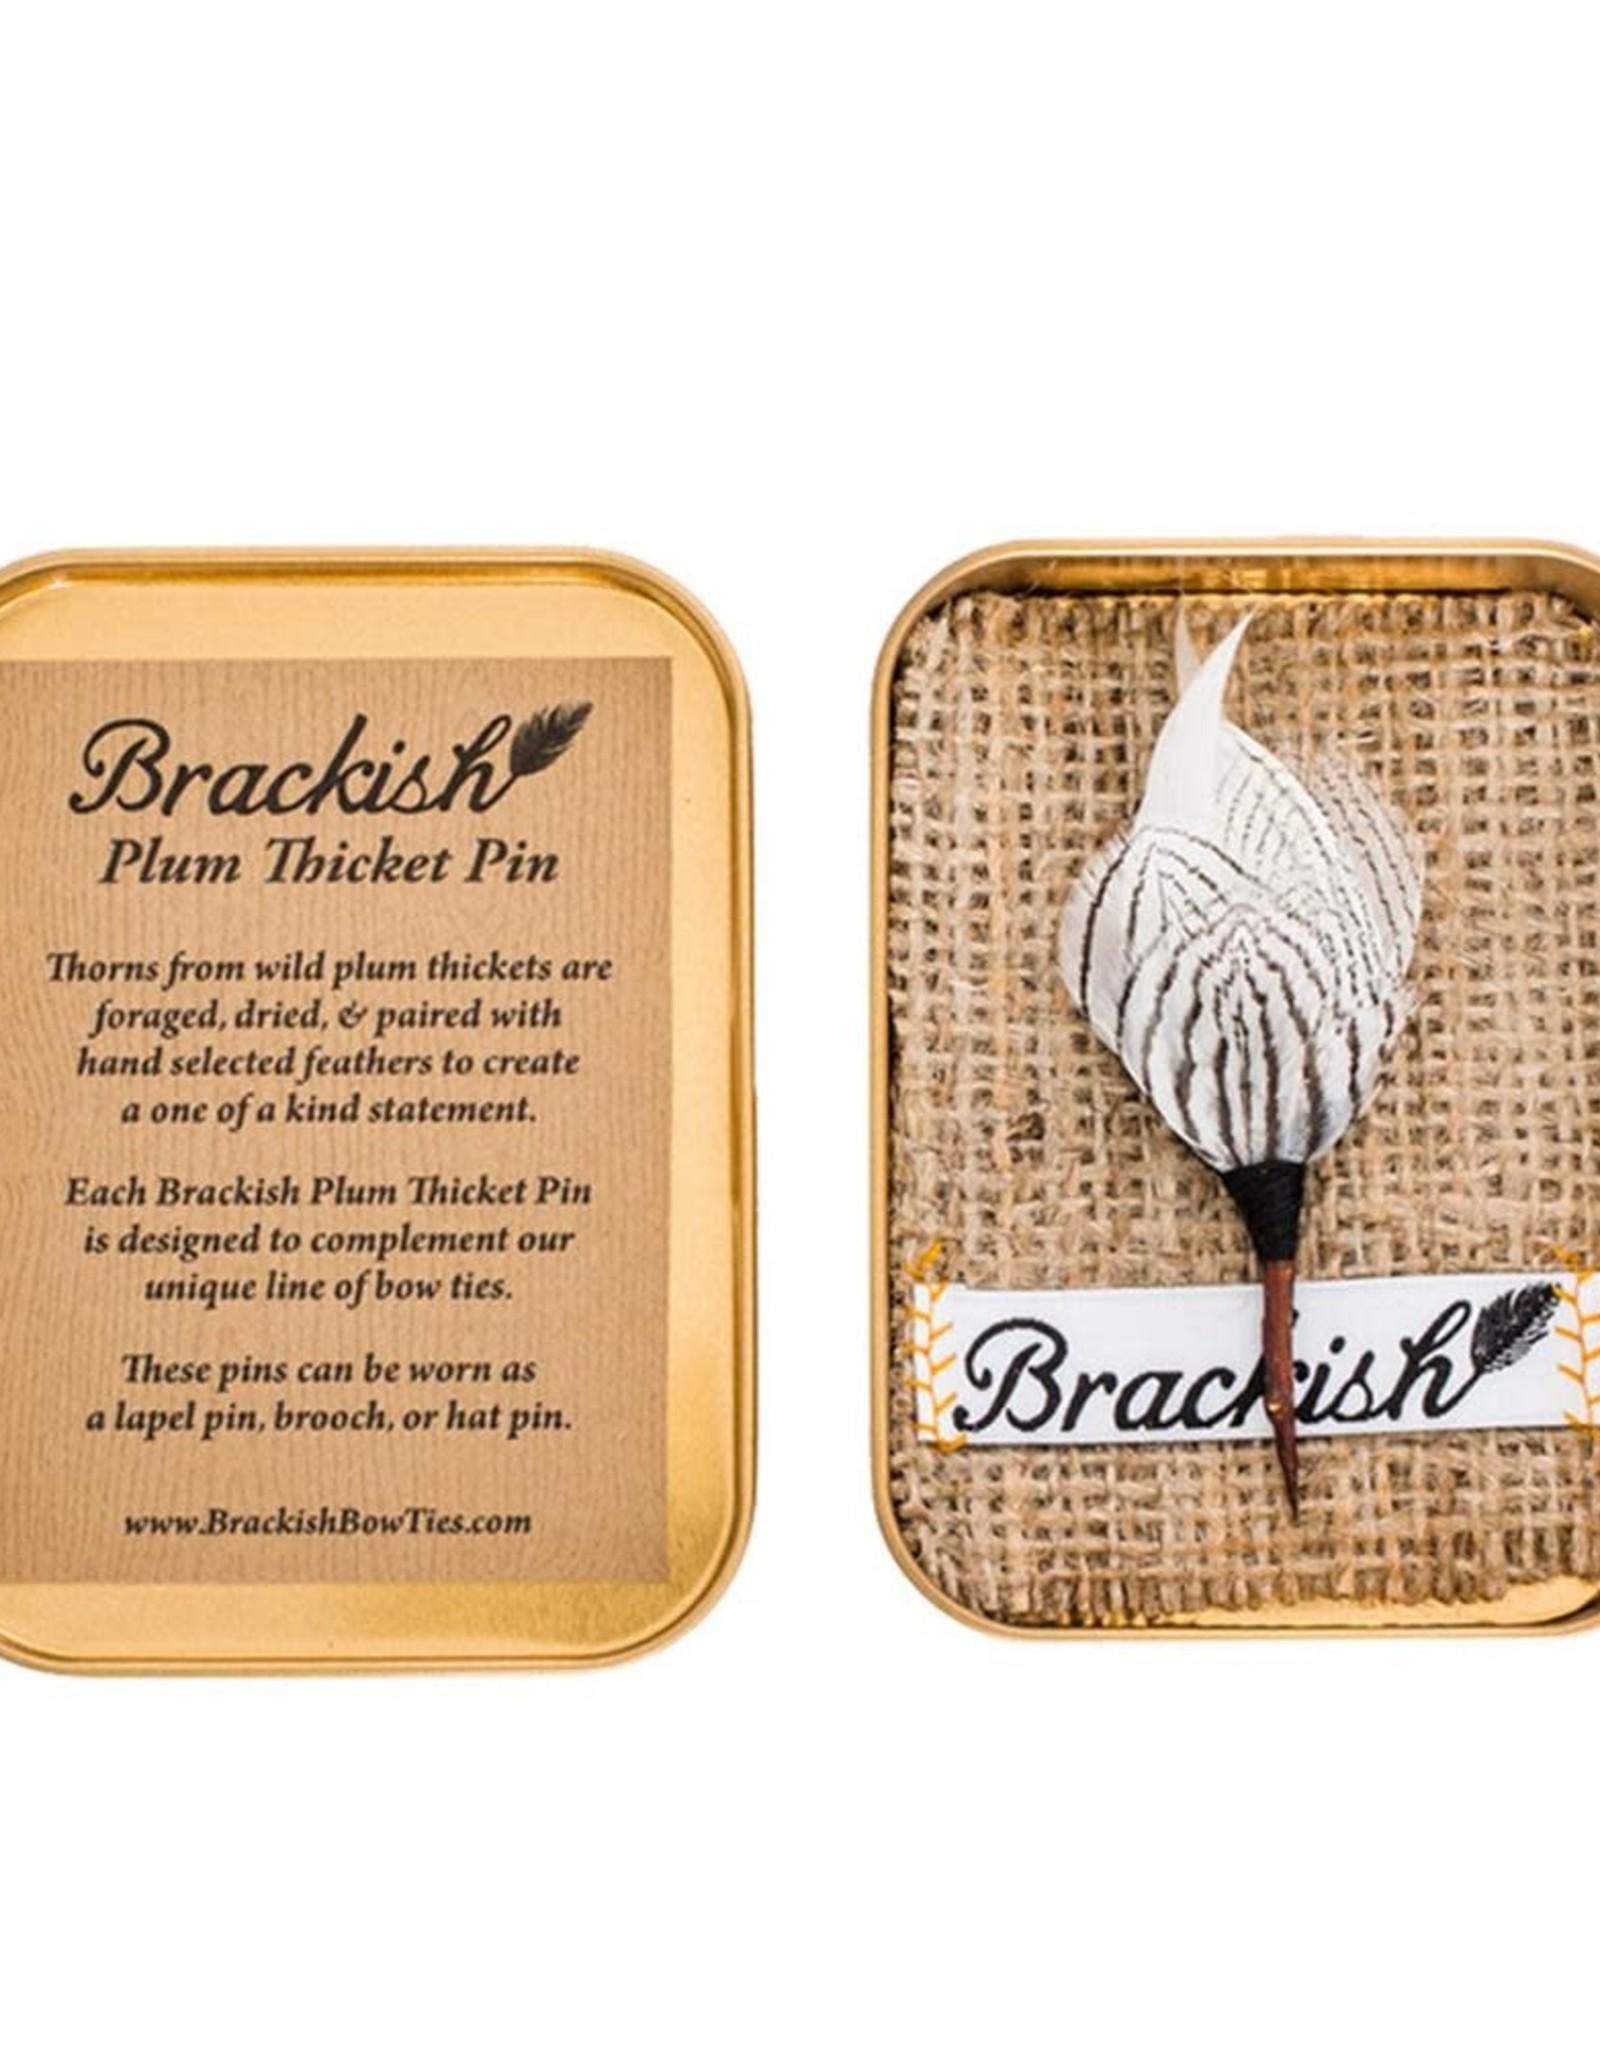 Brackish Steel City Lapel Pin (Pheasant Feathers)